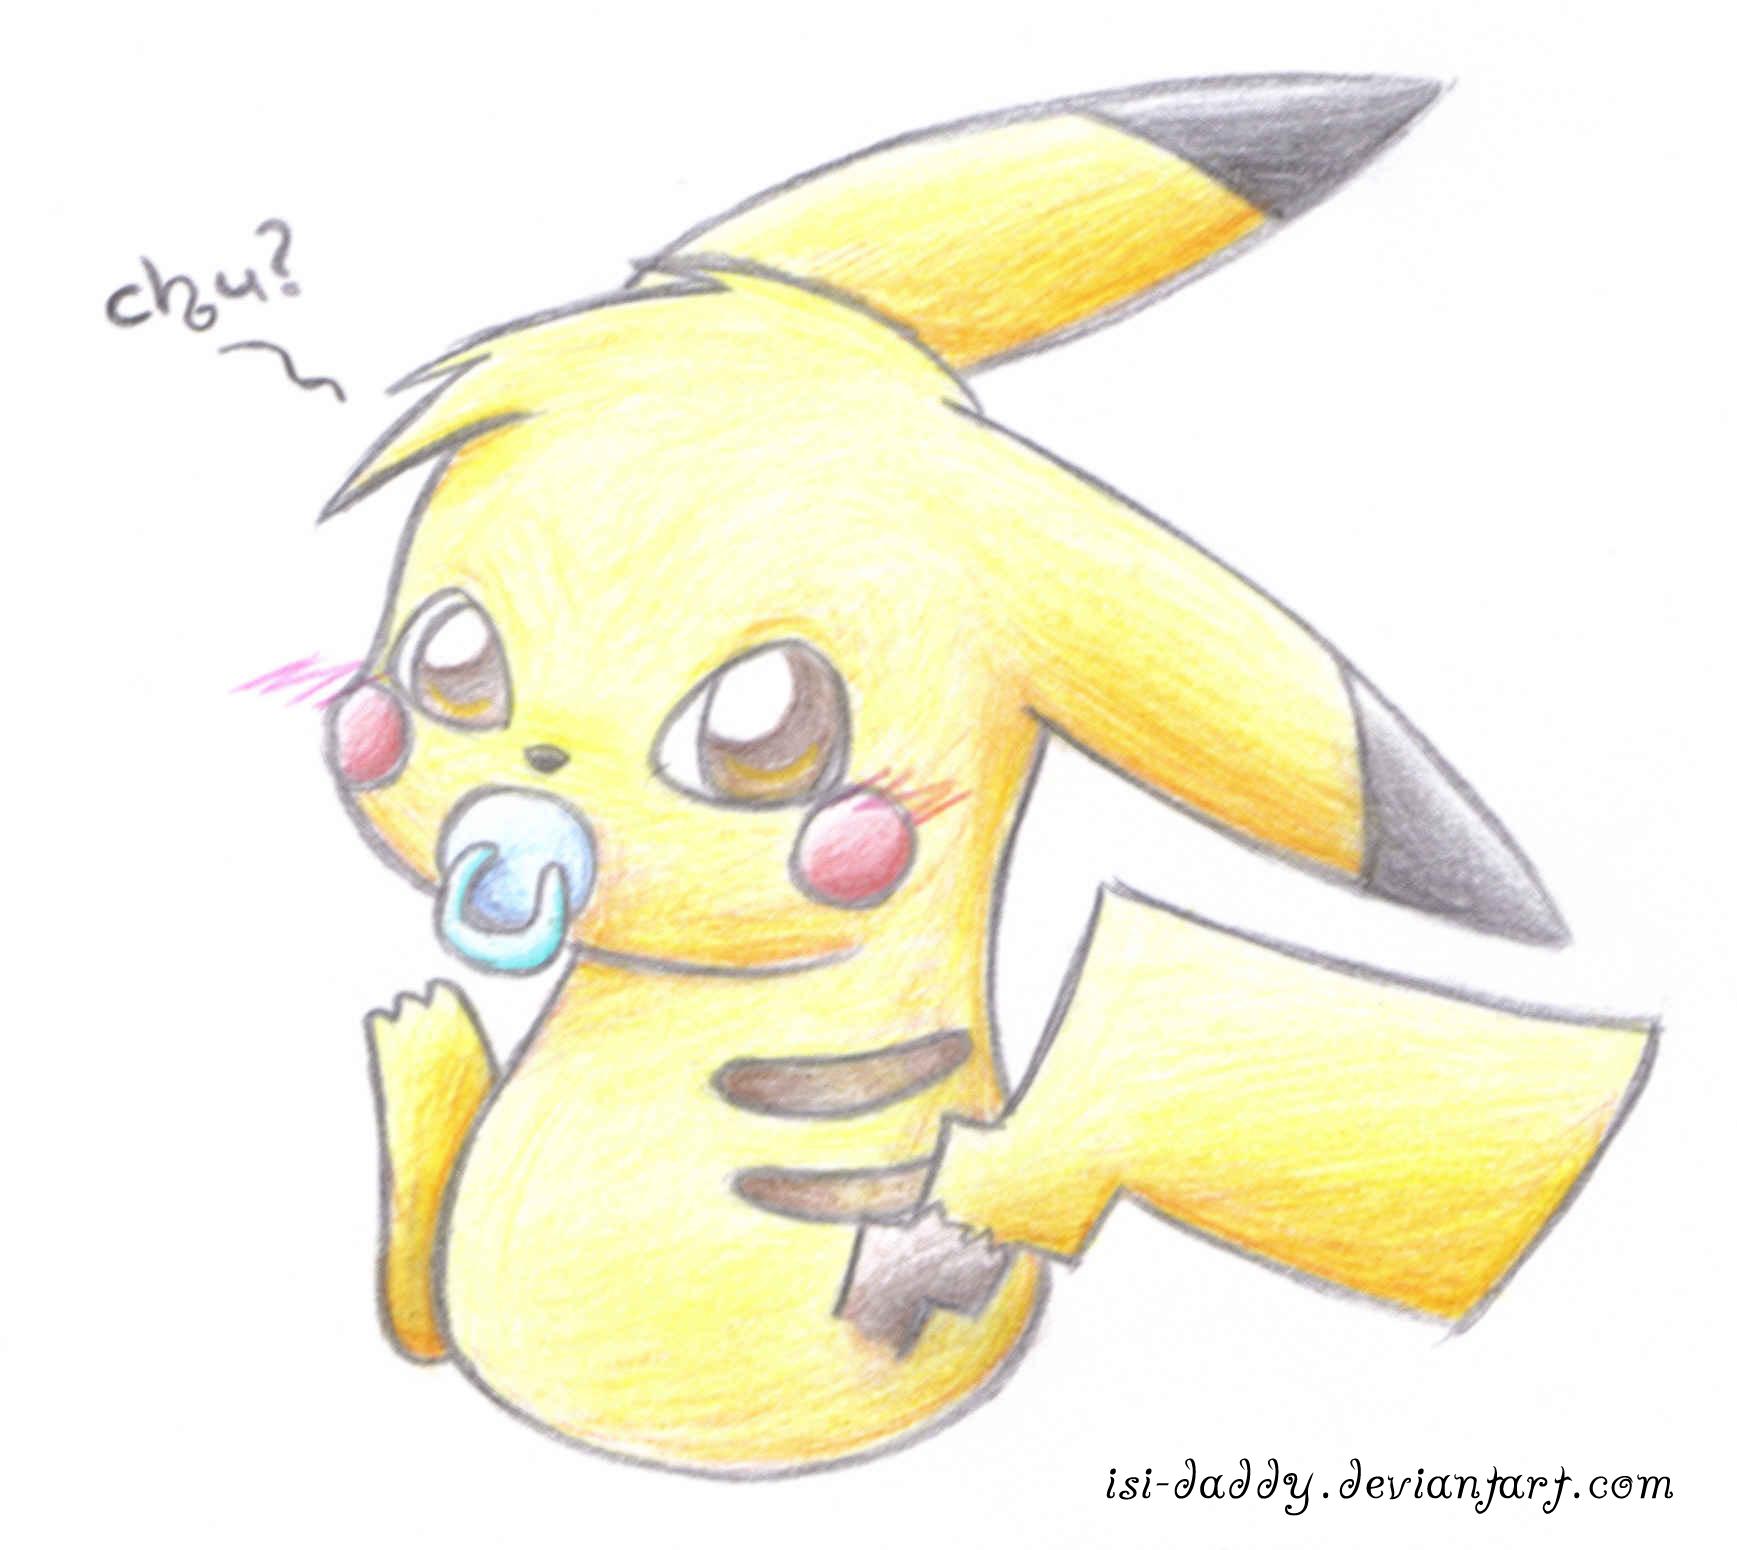 Cute baby pikachu - photo#17